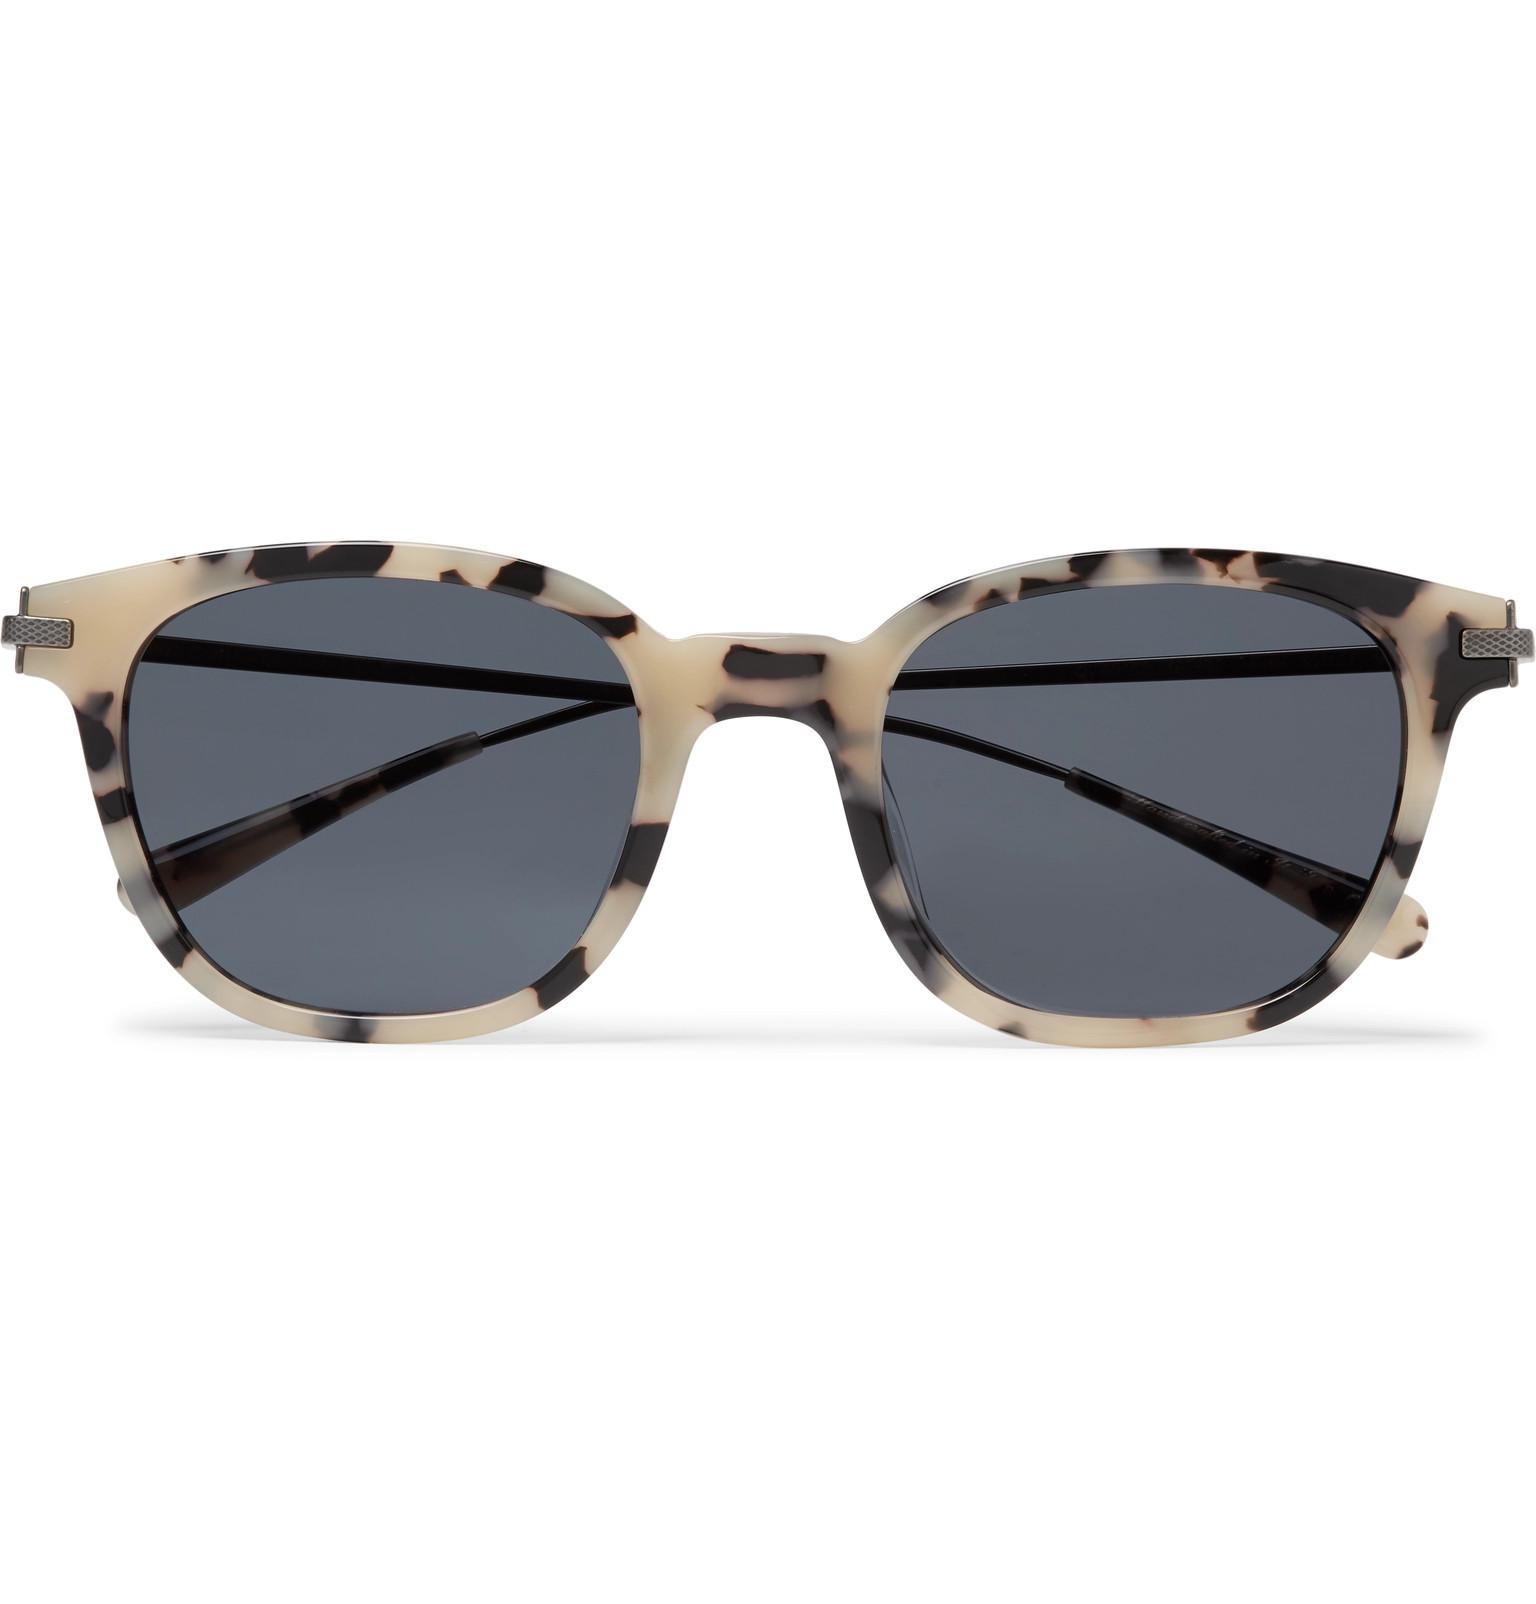 c493203a9194 Berluti+ Oliver Peoples Miami Square-Frame Tortoiseshell Acetate and  Gunmetal-Tone Sunglasses